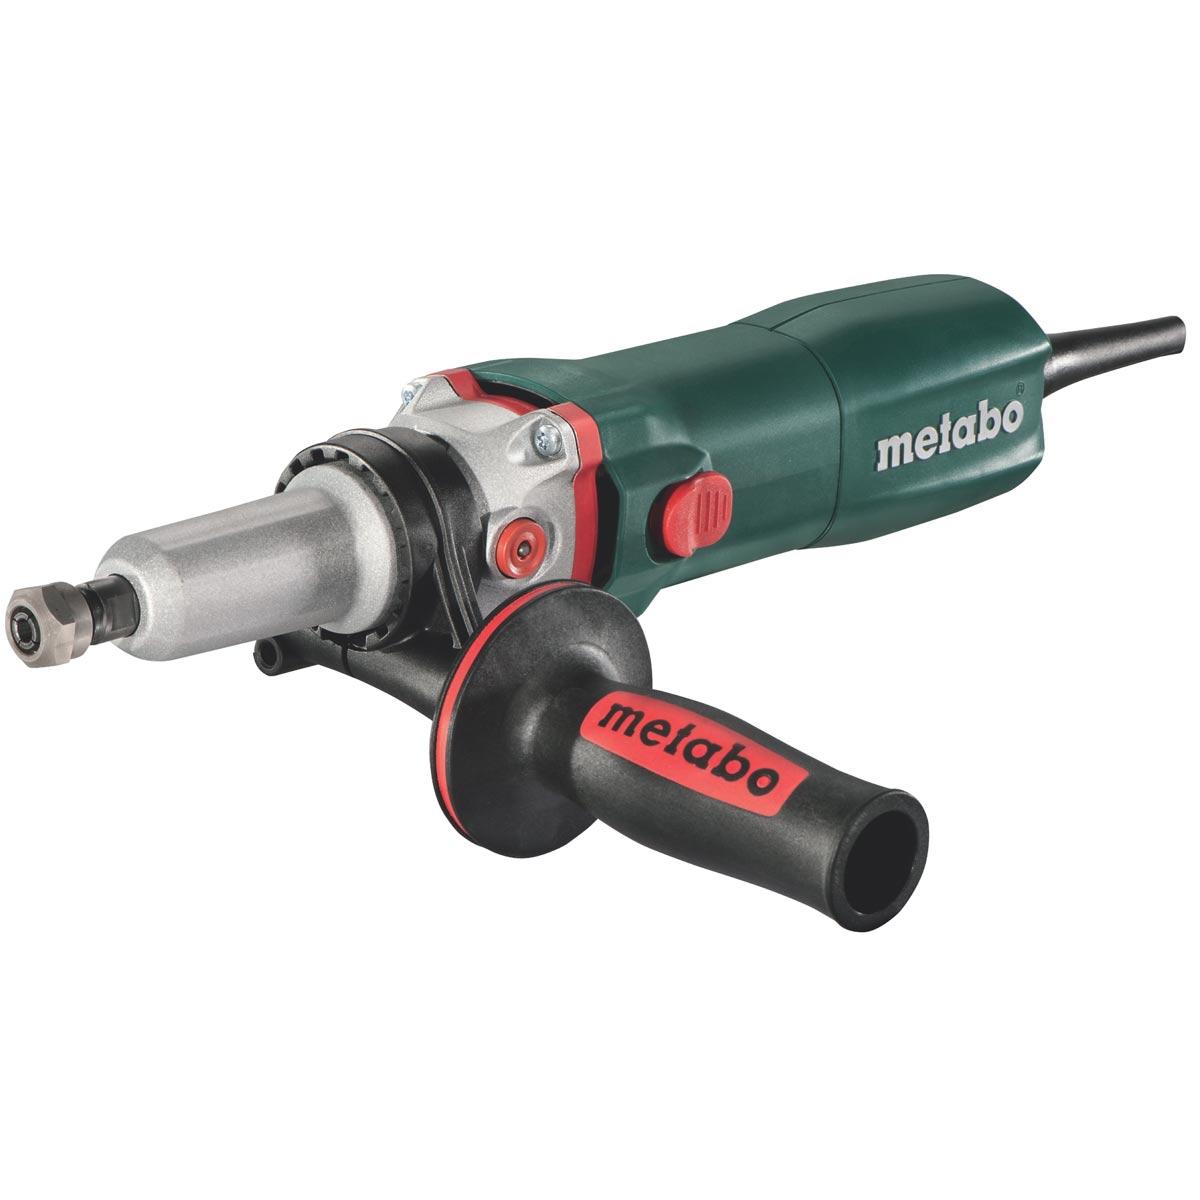 Tools & Electrical Tools Metabo GE950L 240V Straight Grinder